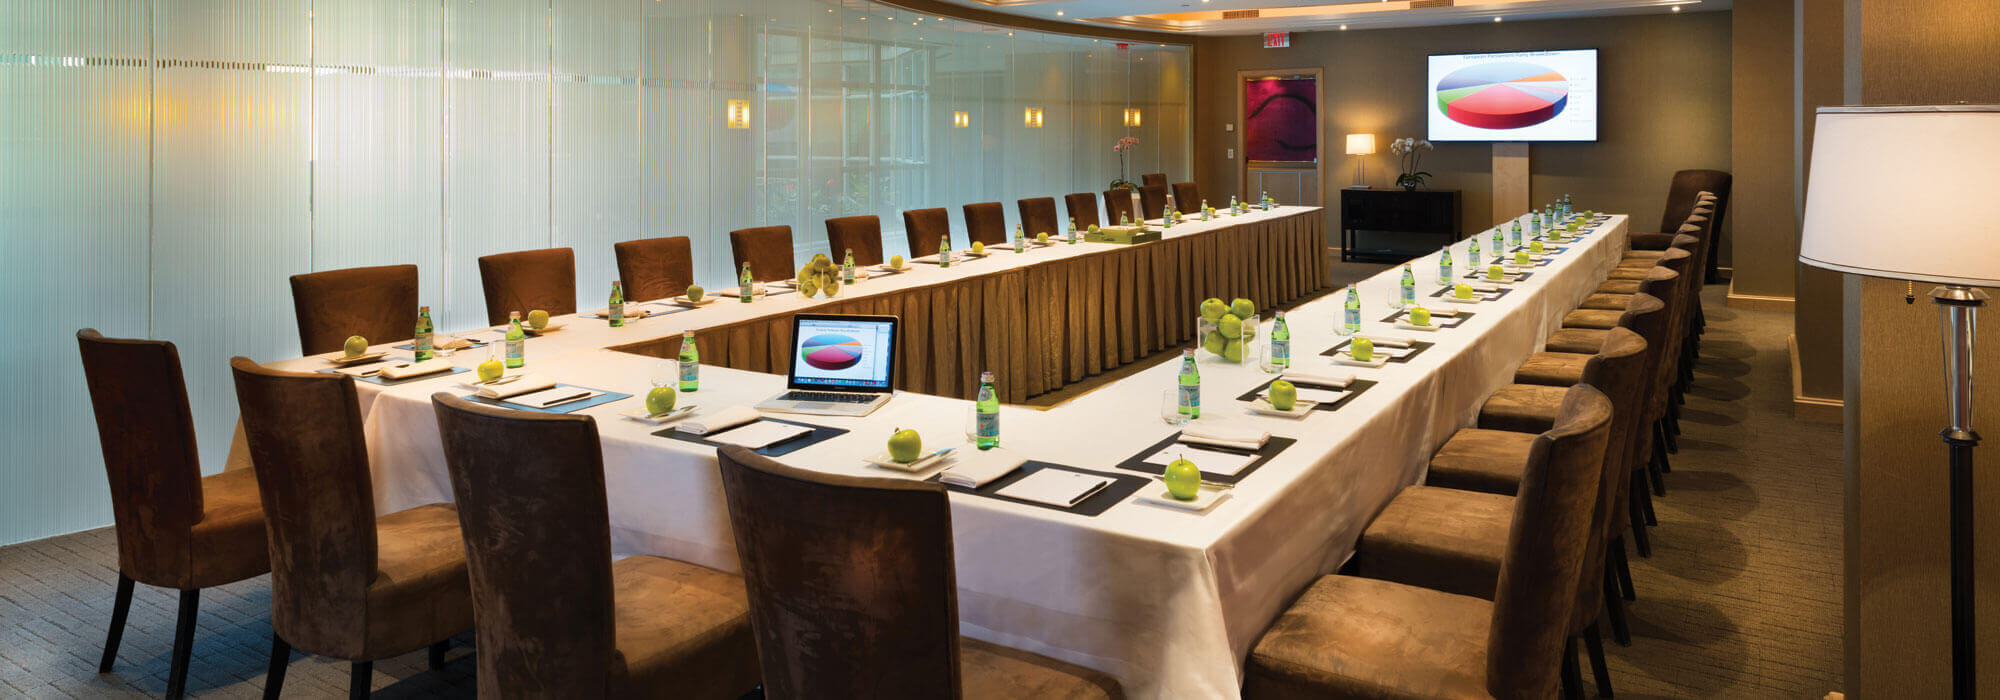 SoHo Hotel amenities Tribeca meeting space